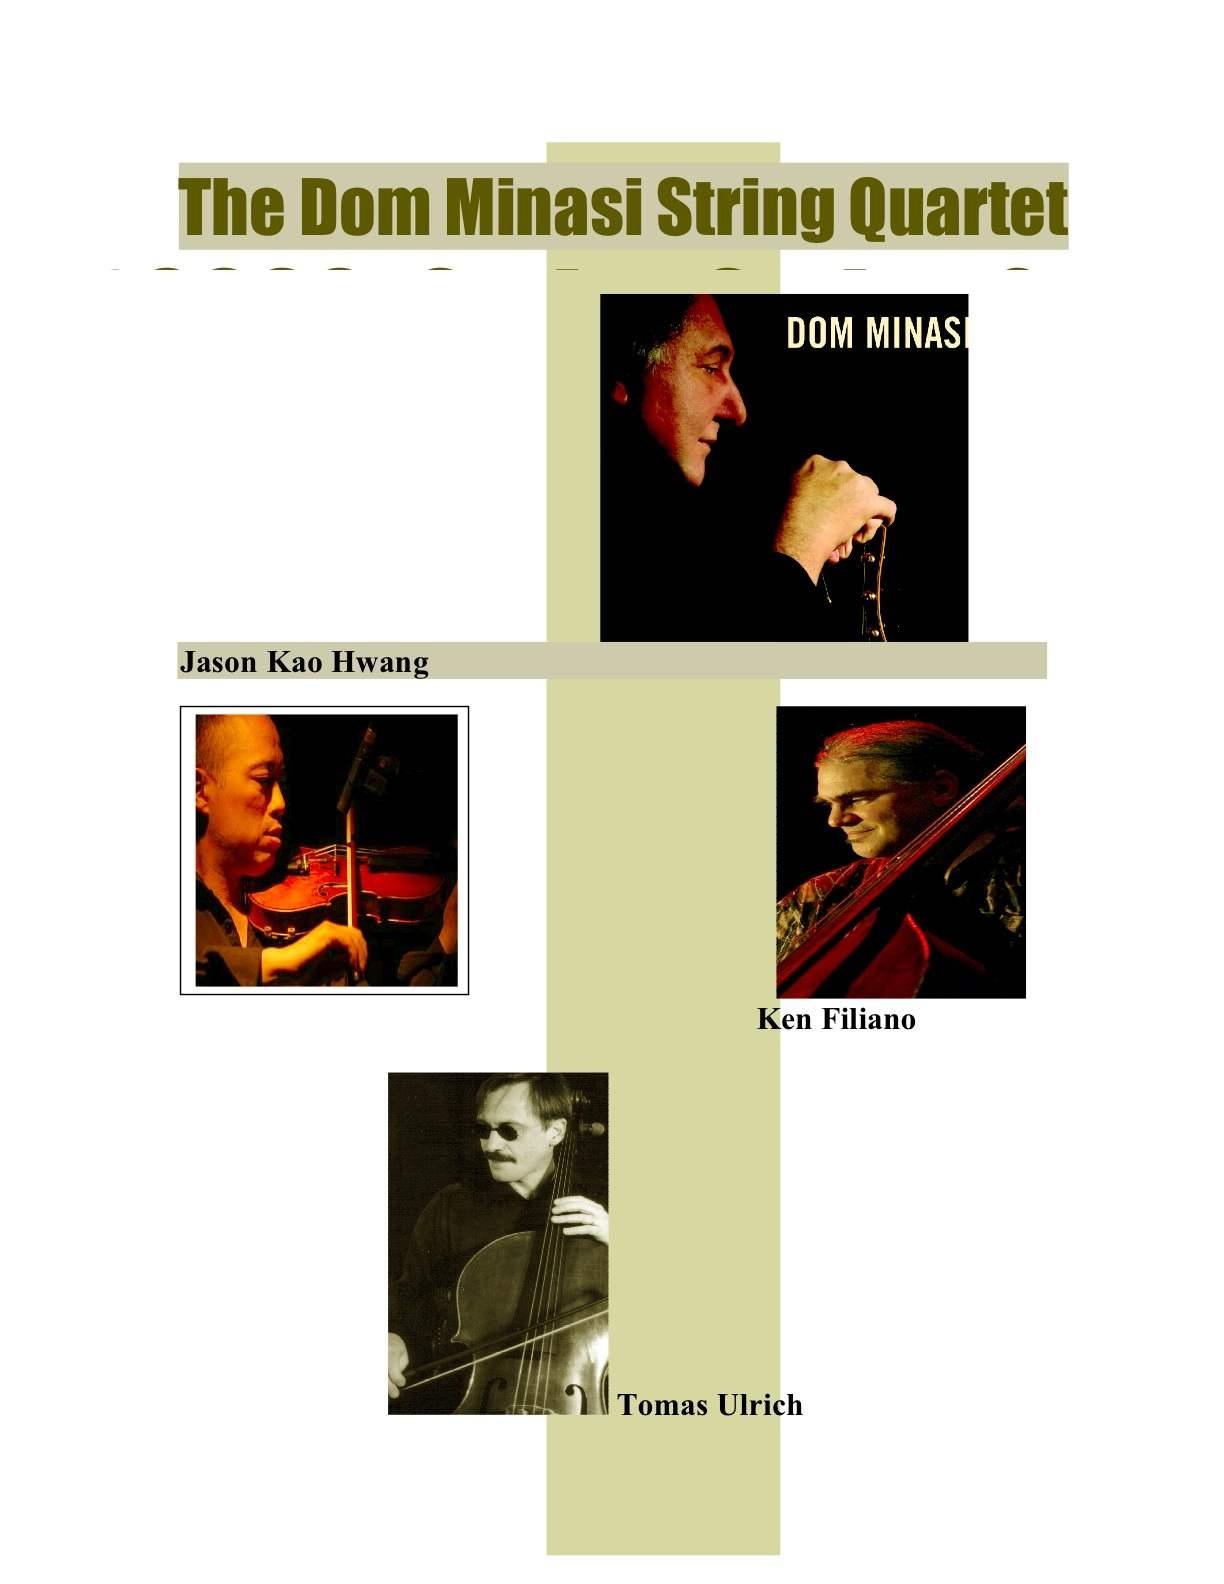 The Dom Minasi String Quartet